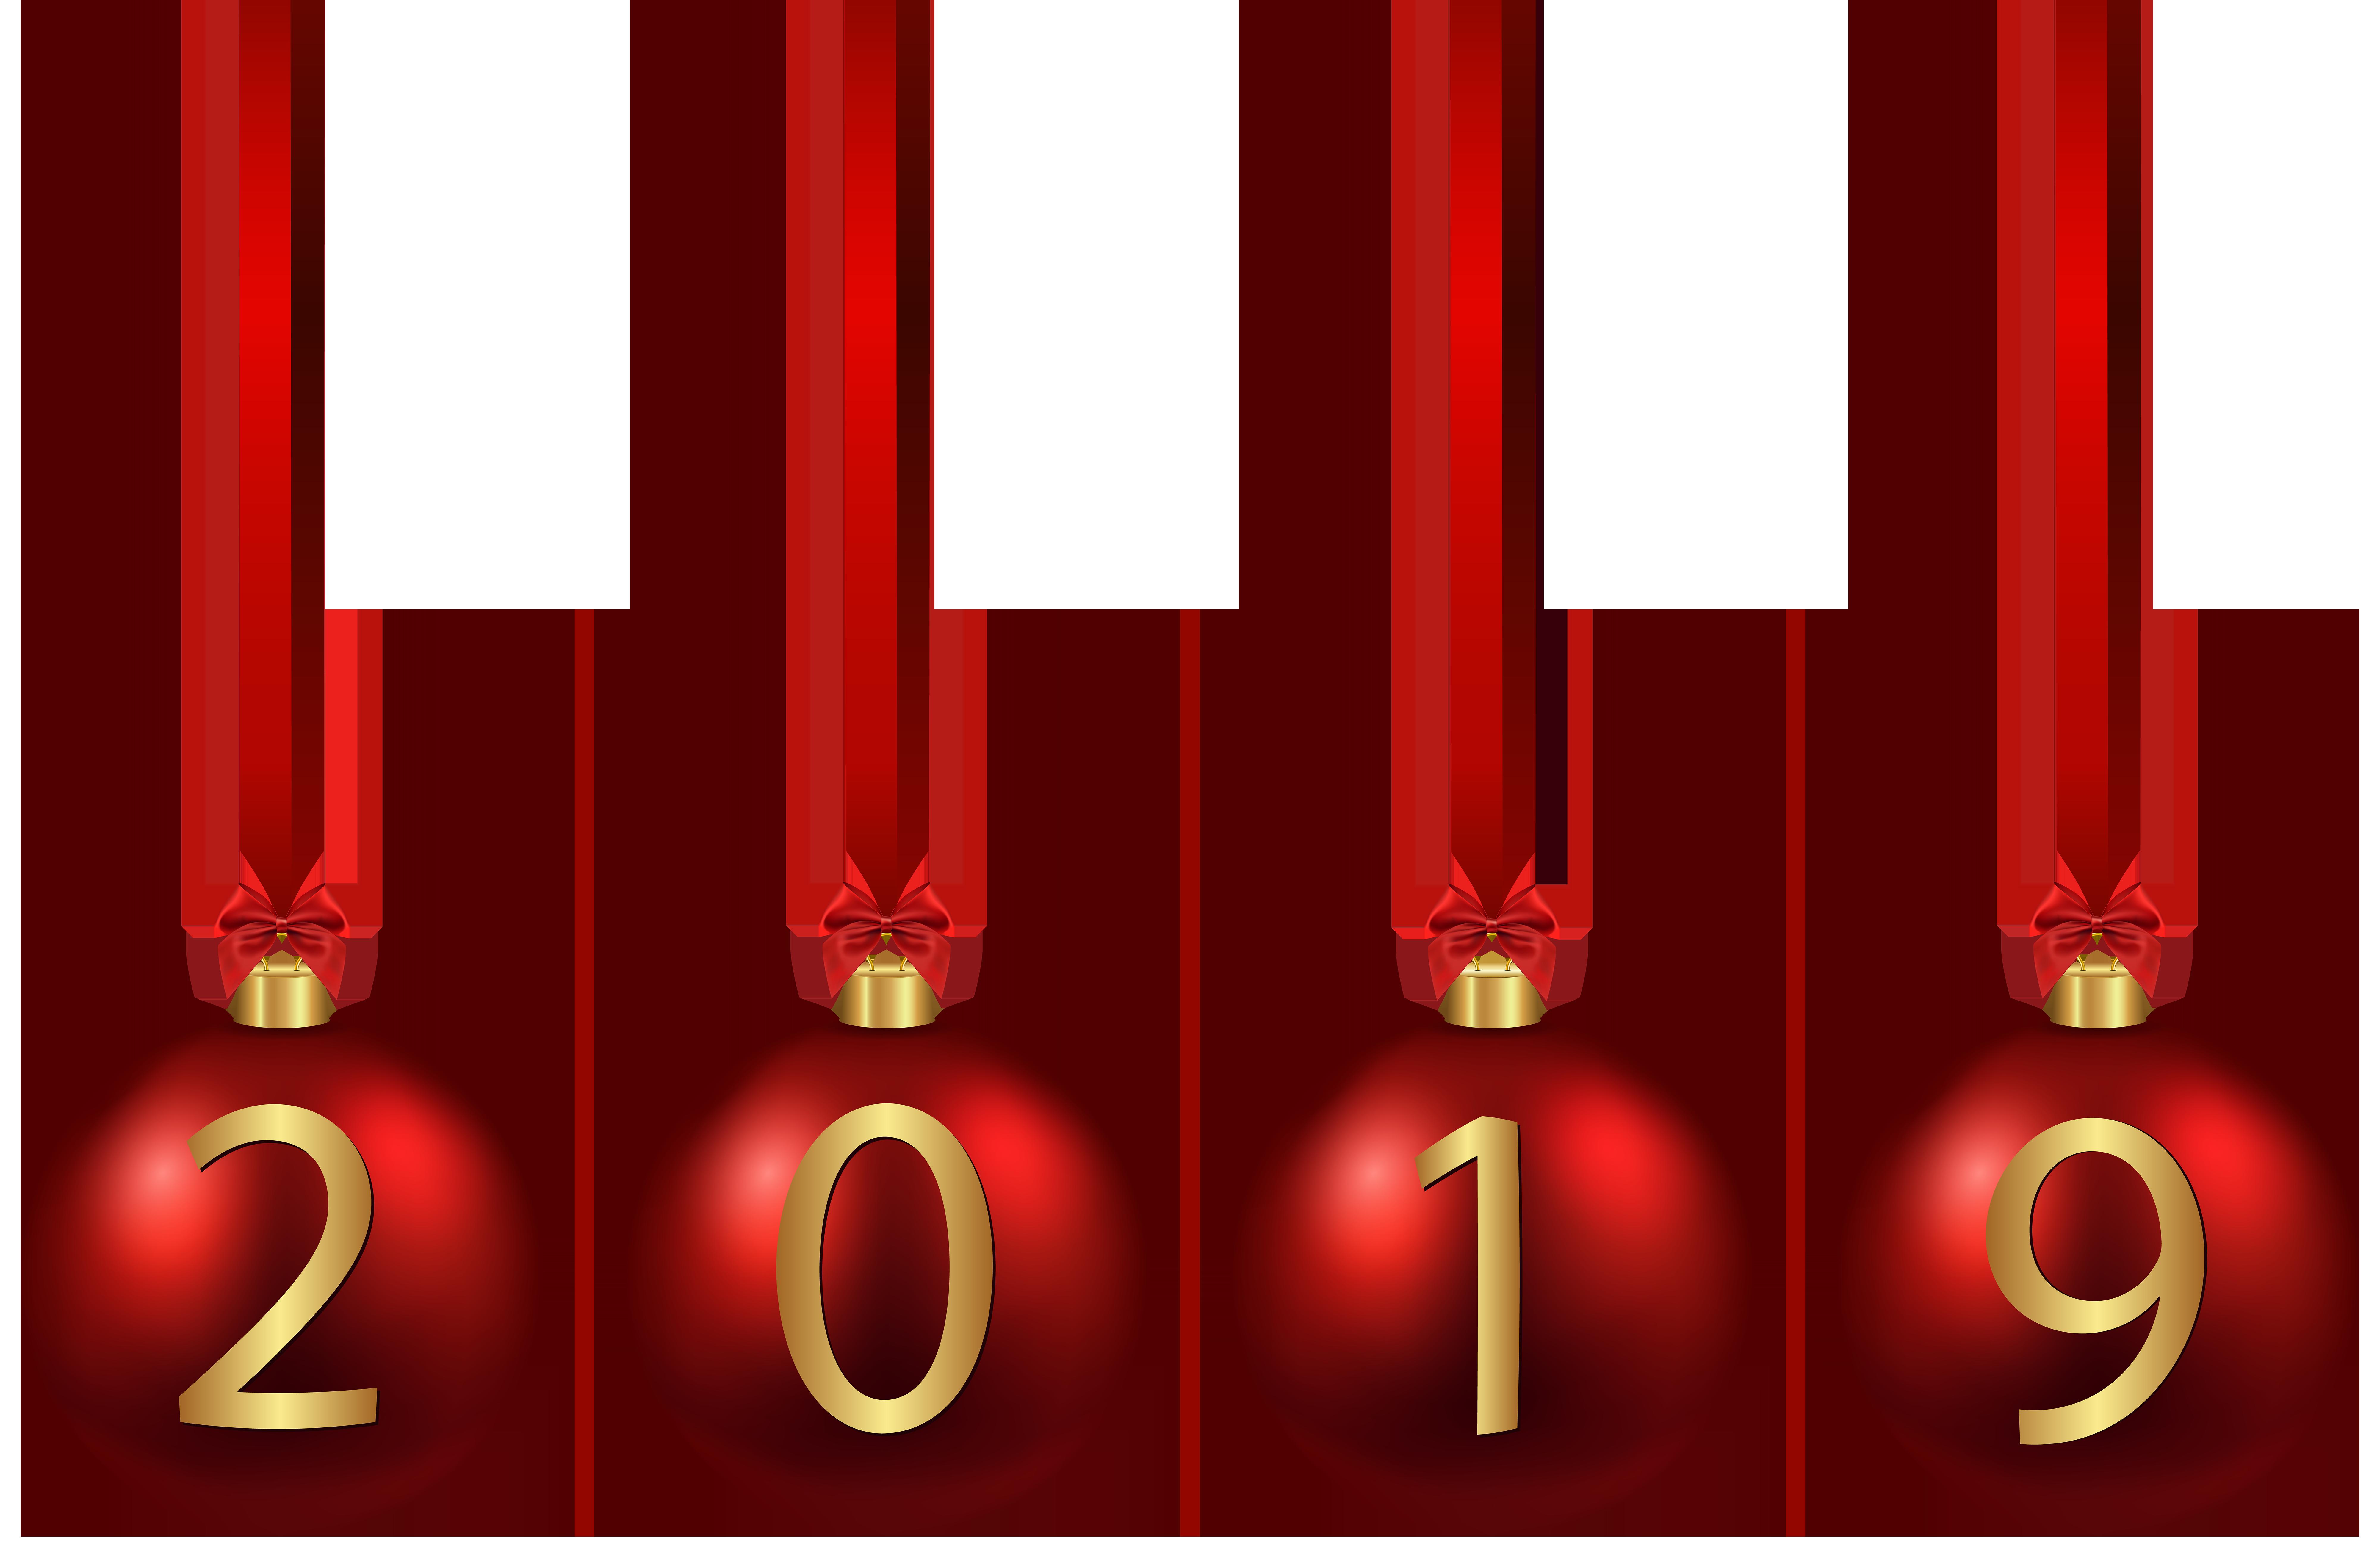 2019 Red Christmas Balls PNG Image.